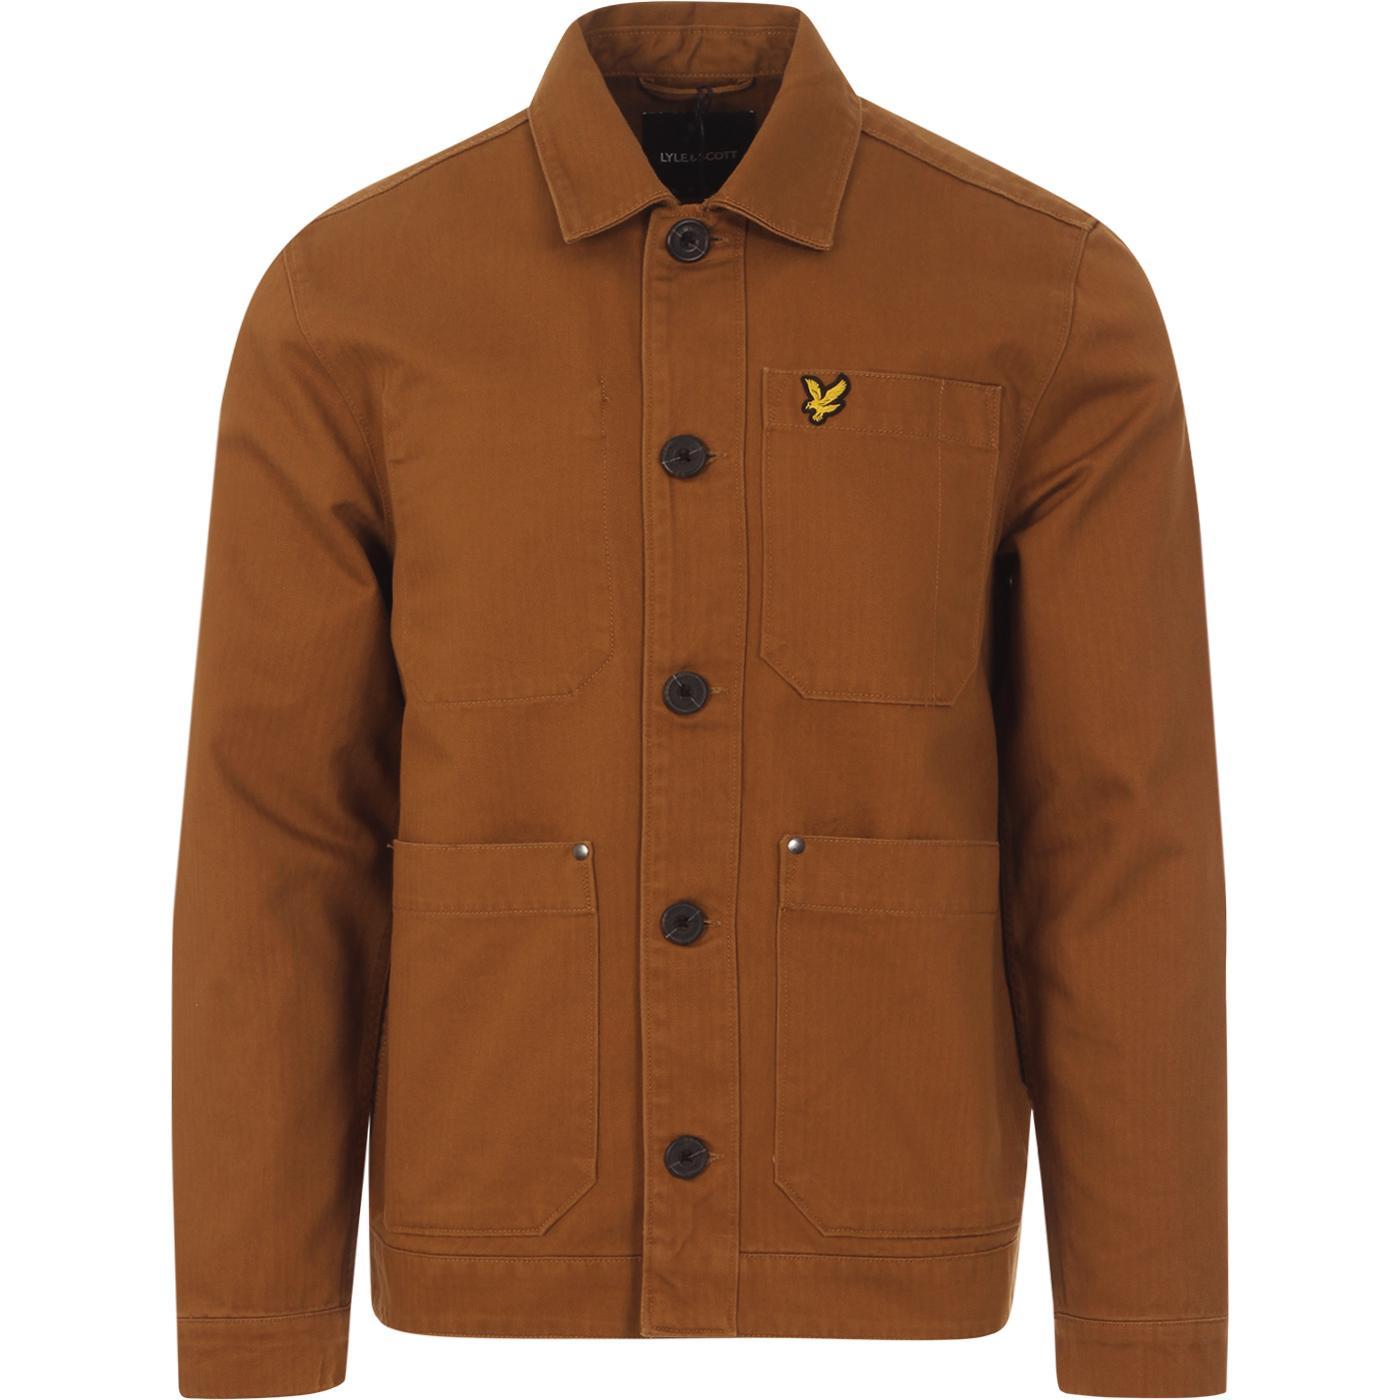 LYLE & SCOTT Herringbone Military Chore Jacket (T)